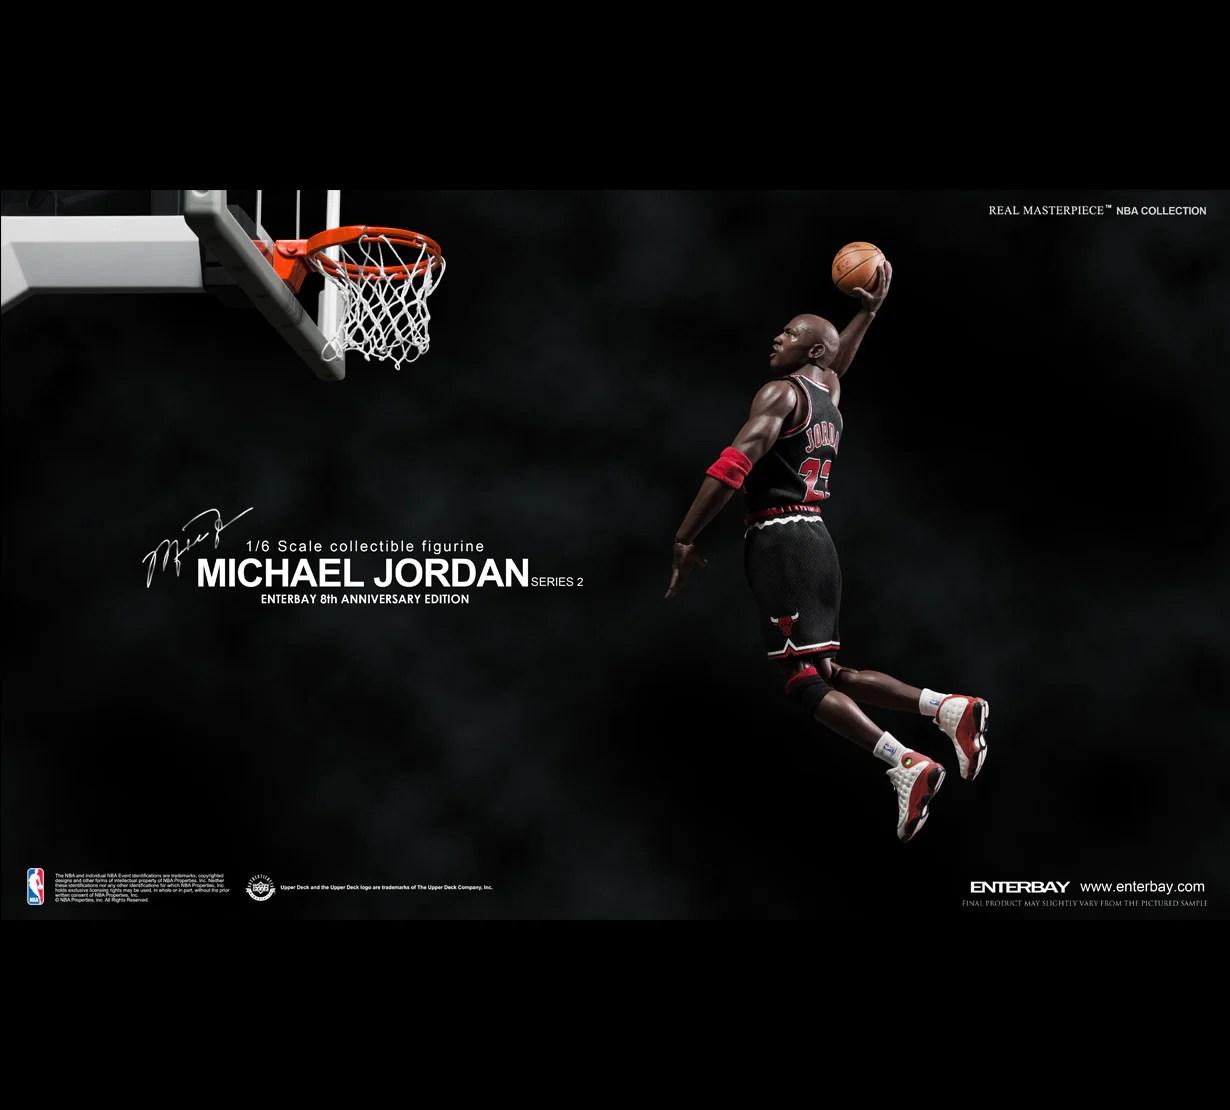 RM 1055 Michael Jordan Series 2 23 Black Jersey